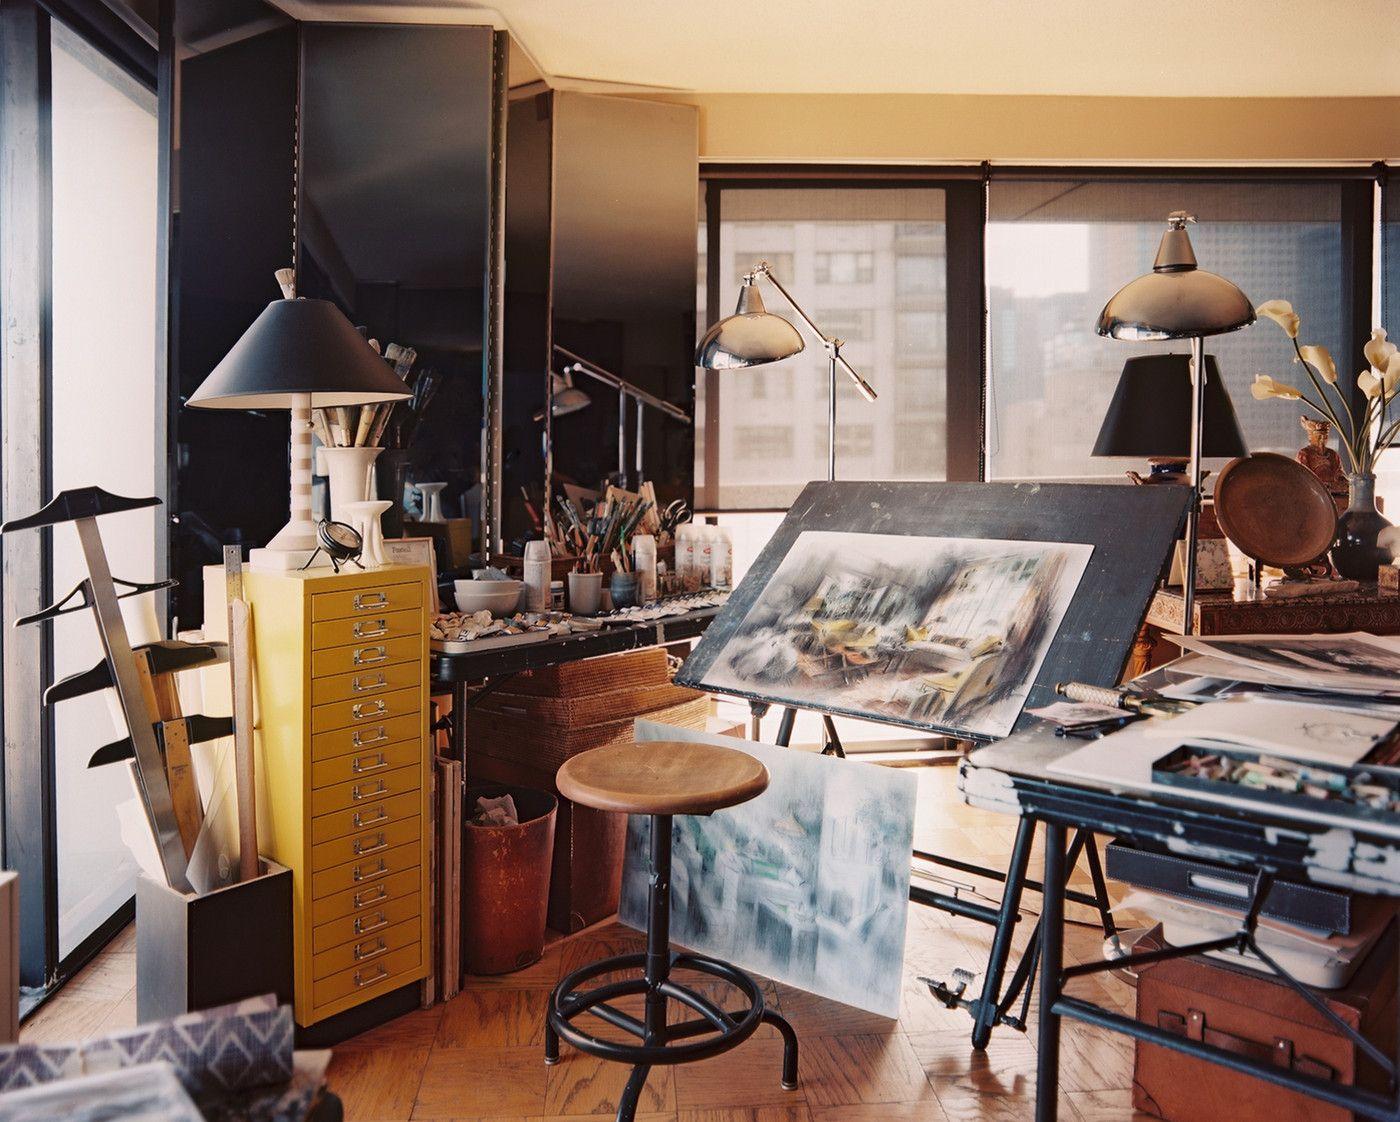 Vintage Work Space Photos Studio Studio Apartment Design Art